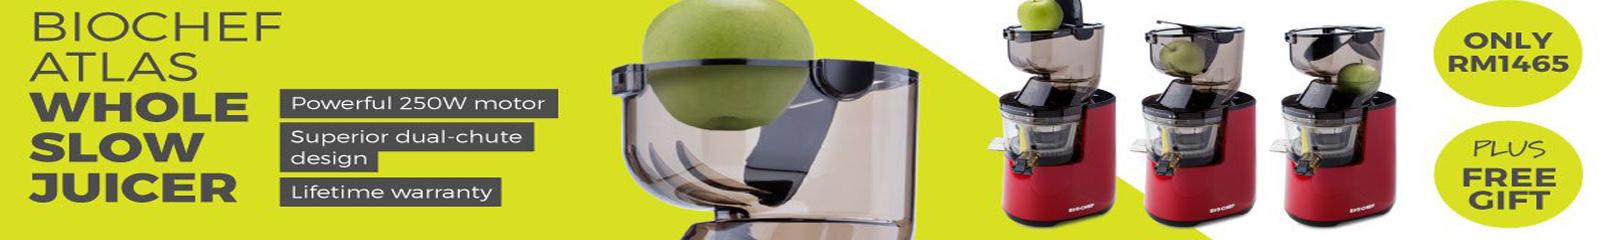 máy ép trái cây: Máy ép trái cây bằng tay - mayep 05